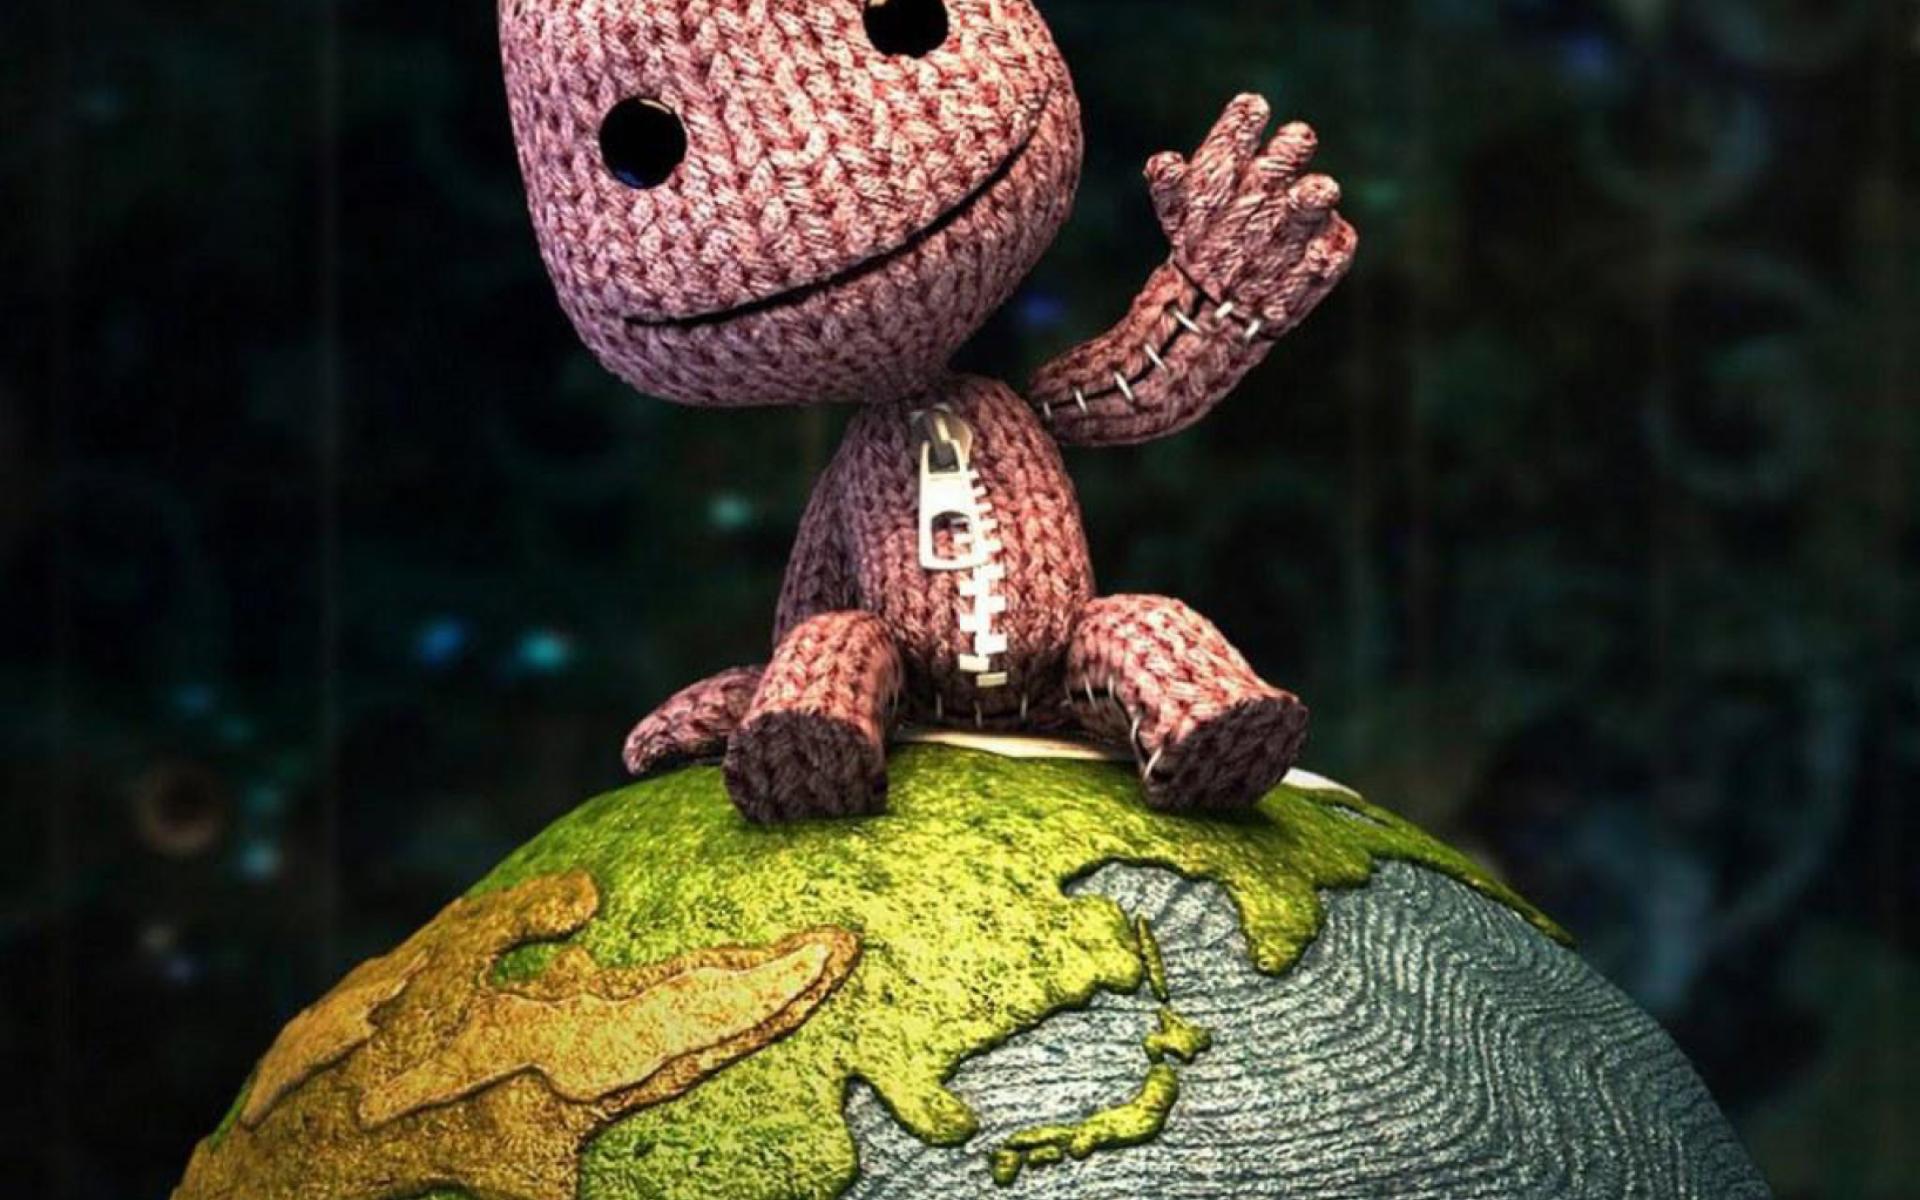 графика игры The Little Big Planet graphics game  № 1878053 бесплатно